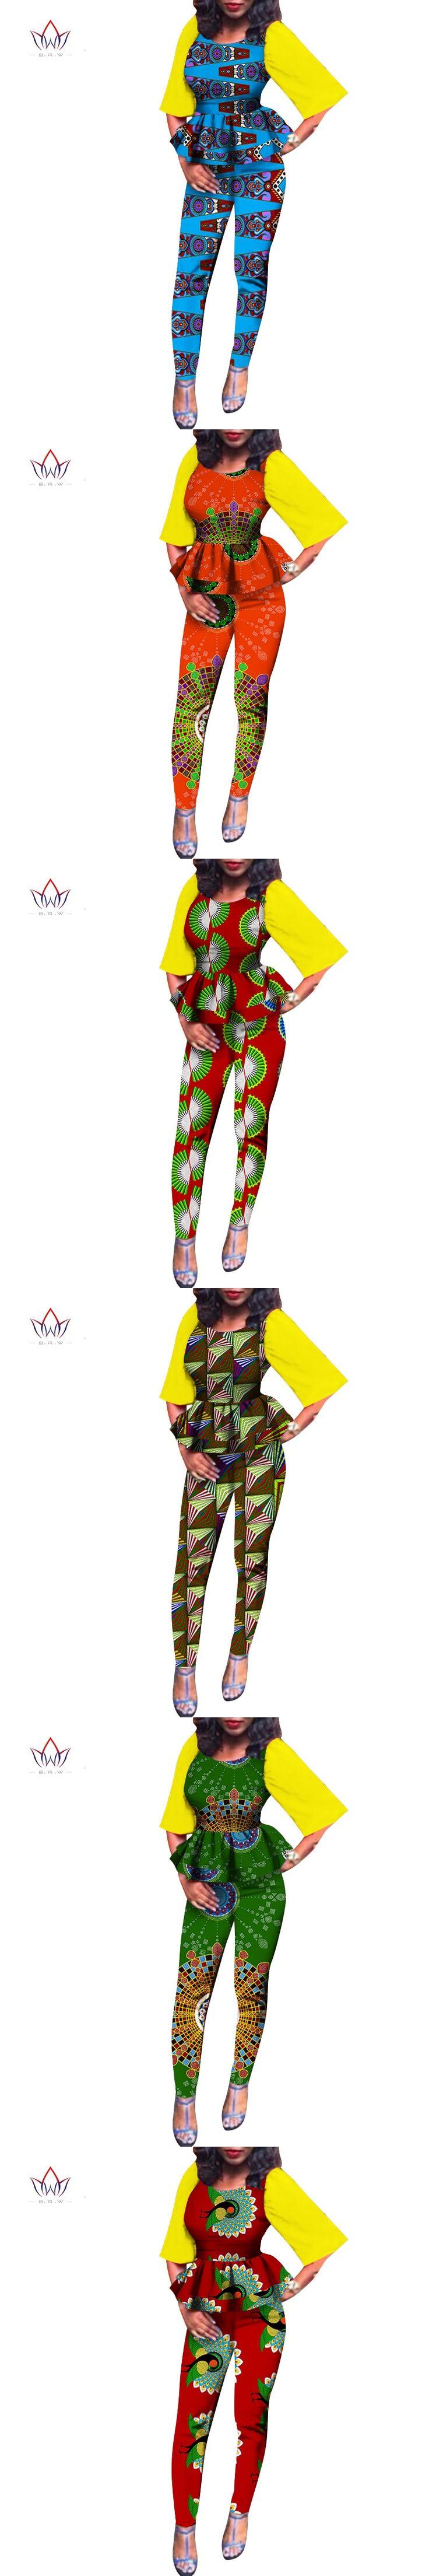 African Dashiki For Women Autumn Top And long Pants Set Women Suit Traditional African Clothing Print Dashiki Set regular WY805